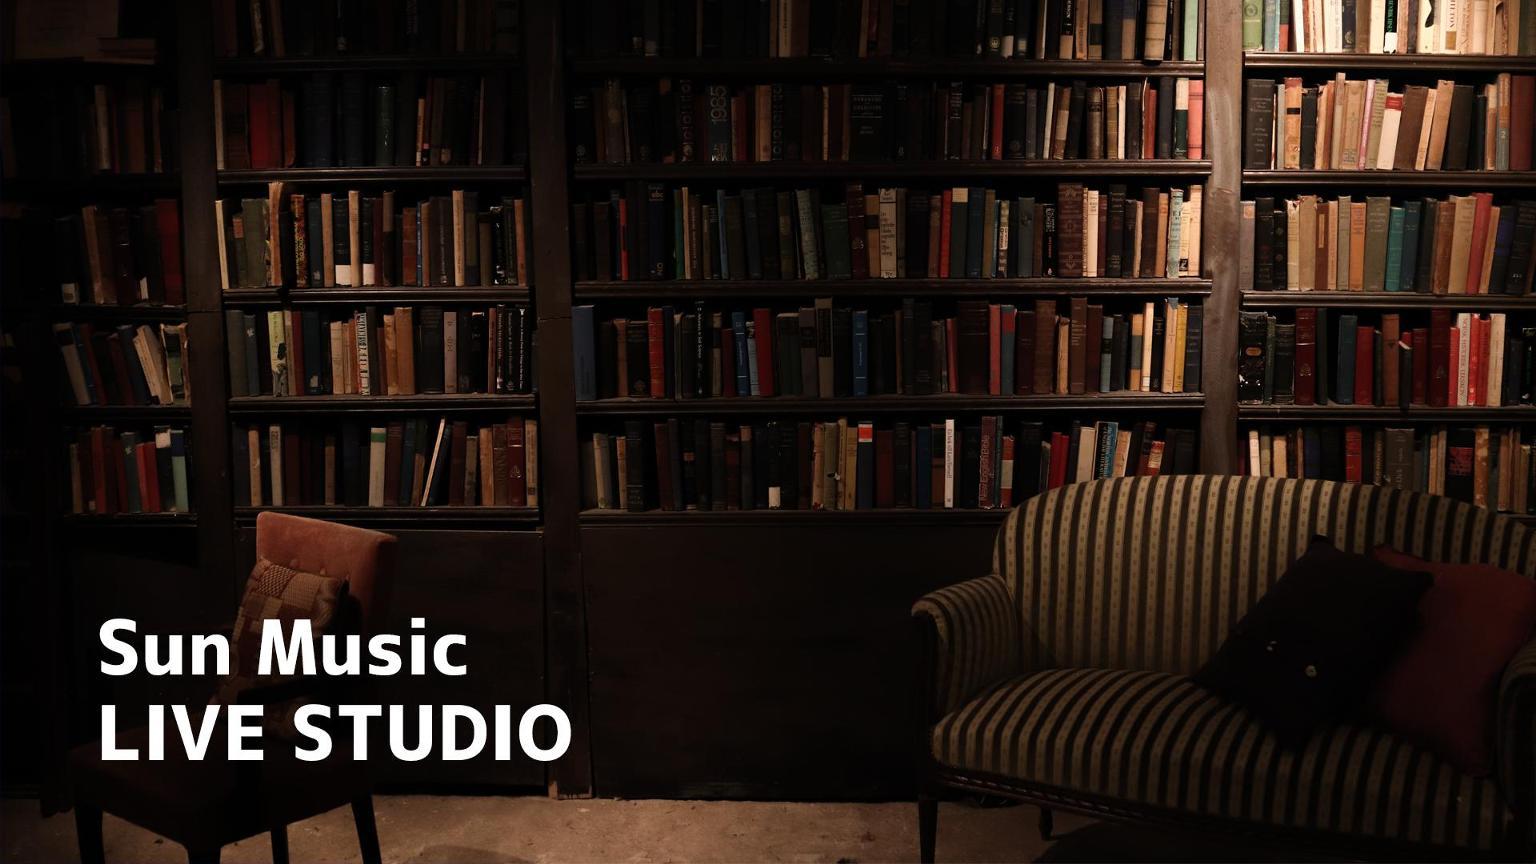 Sun Music Live Studio